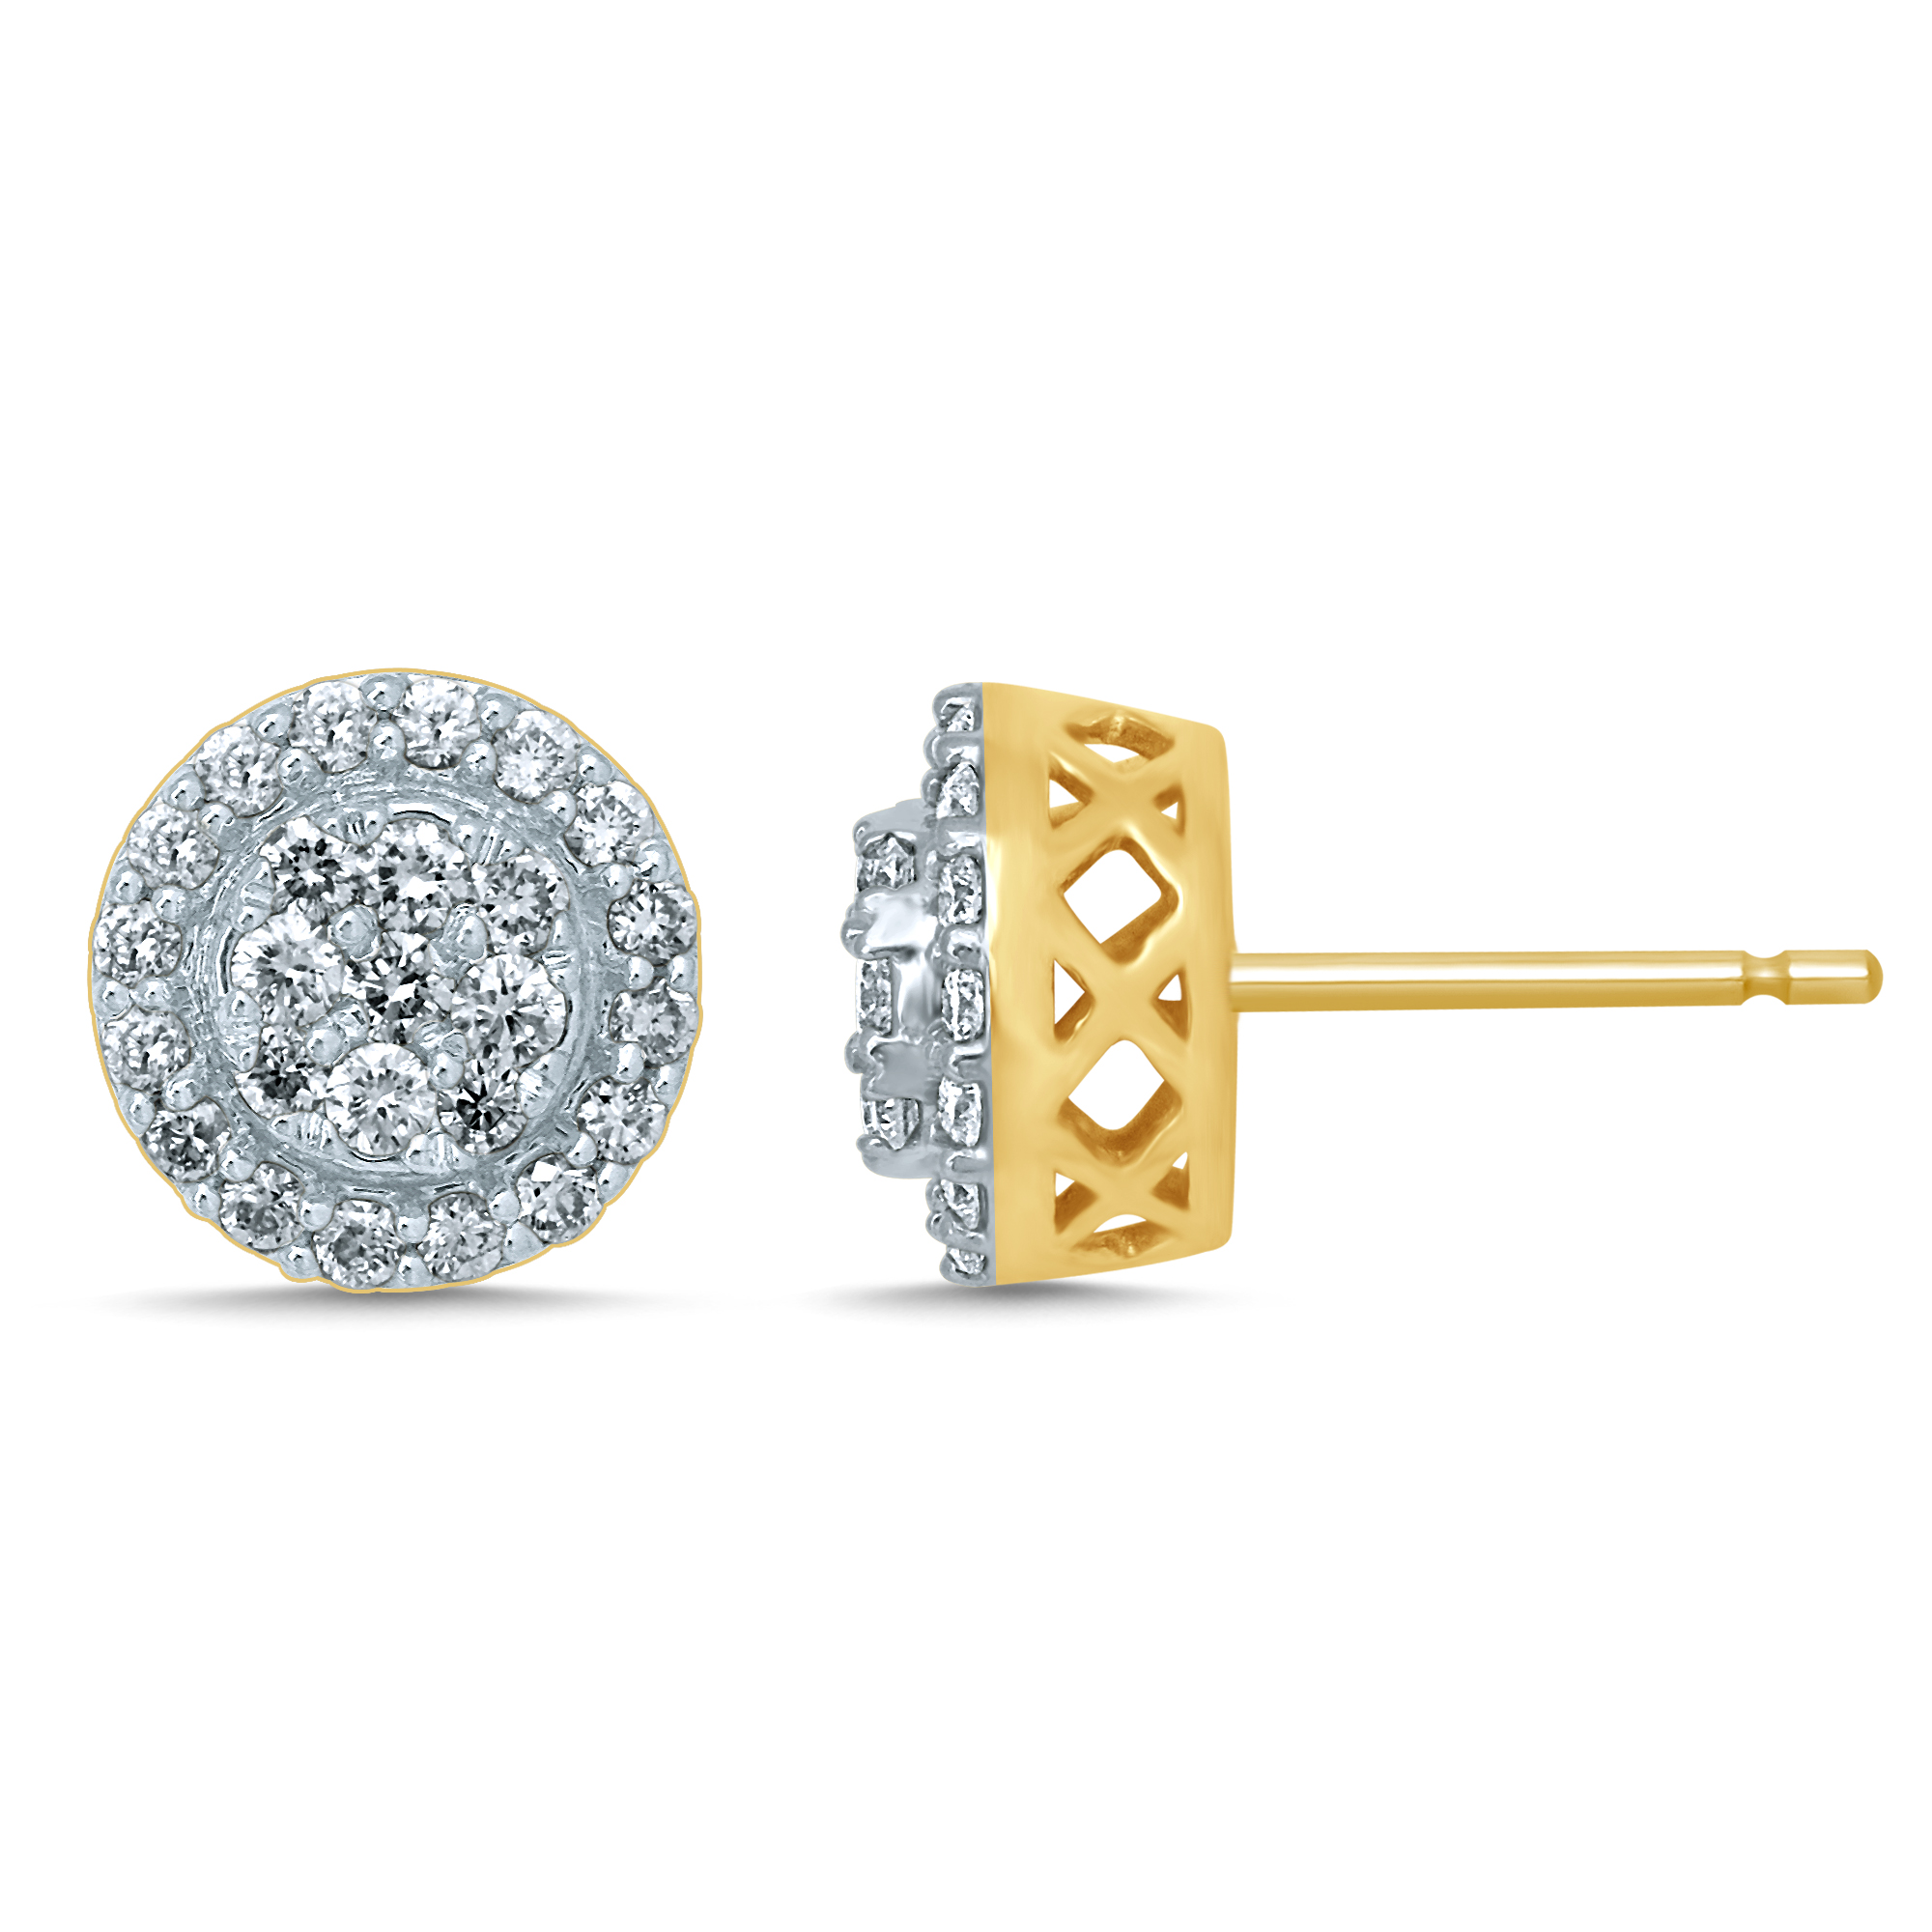 9ct Yellow Gold 3/4 Carat Diamond Studs